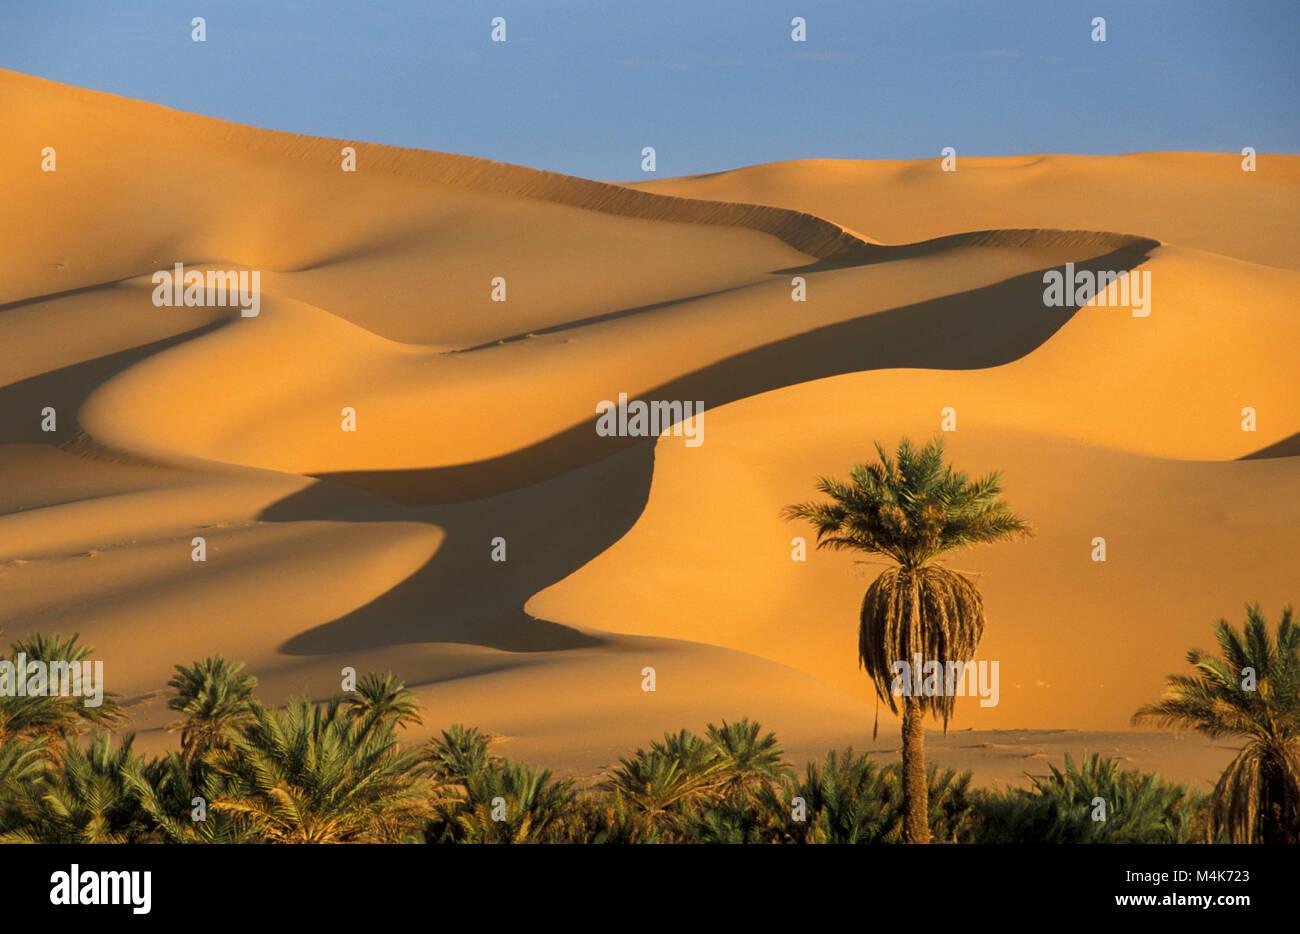 Algeria. Taghit or Tarit. Western Sand Sea. Grand Erg Occidental. Sahara desert. Sand dunes. Sand Sea. Palm trees. - Stock Image